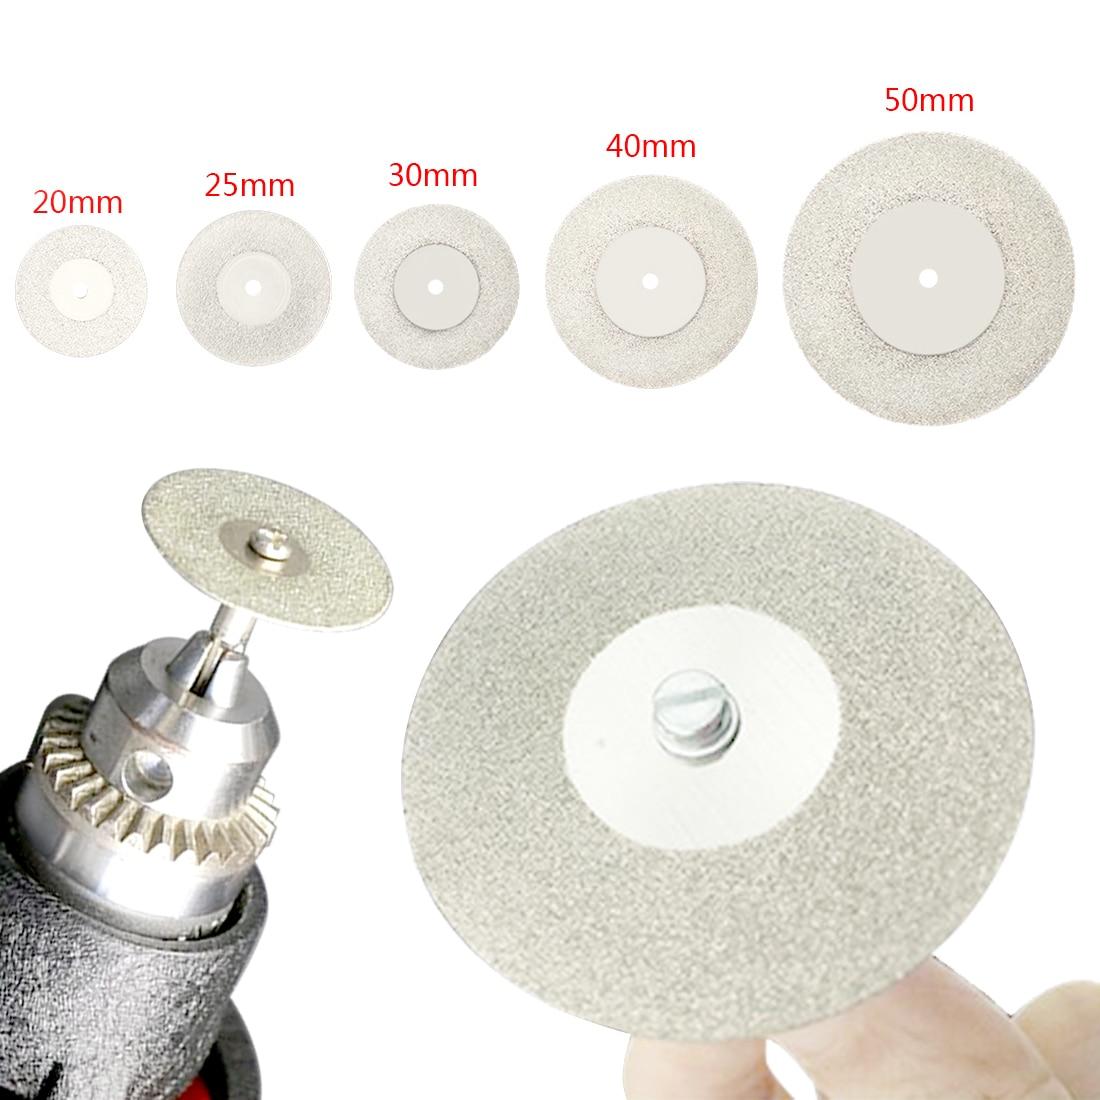 20-50mm Dremel Accessories Diamond Grinding Wheel Saw Circular Cutting Disc Dremel Rotary Tool Diamond Discs